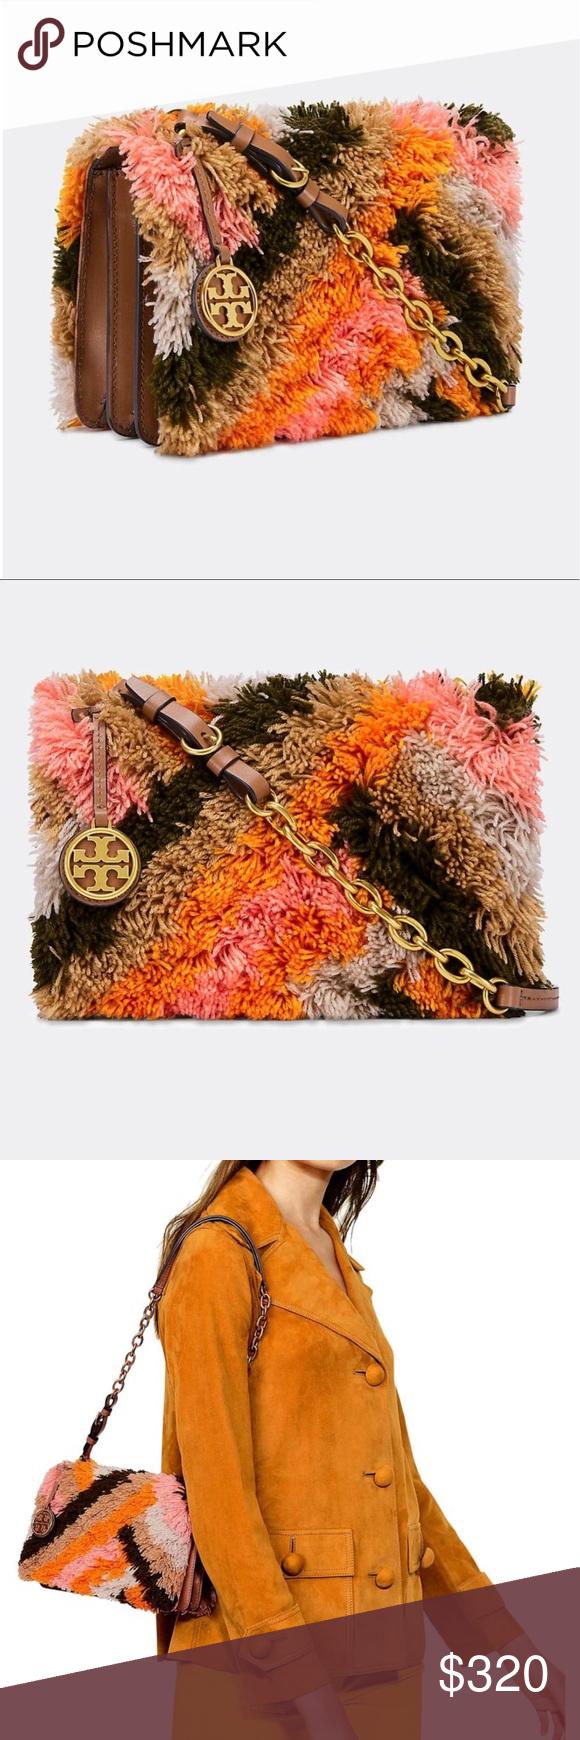 f837692903c NWT Tory Burch Sadie Rug Shoulder Bag Sadie Dark Tiramisu Leather and Yarn Shoulder  Bag New